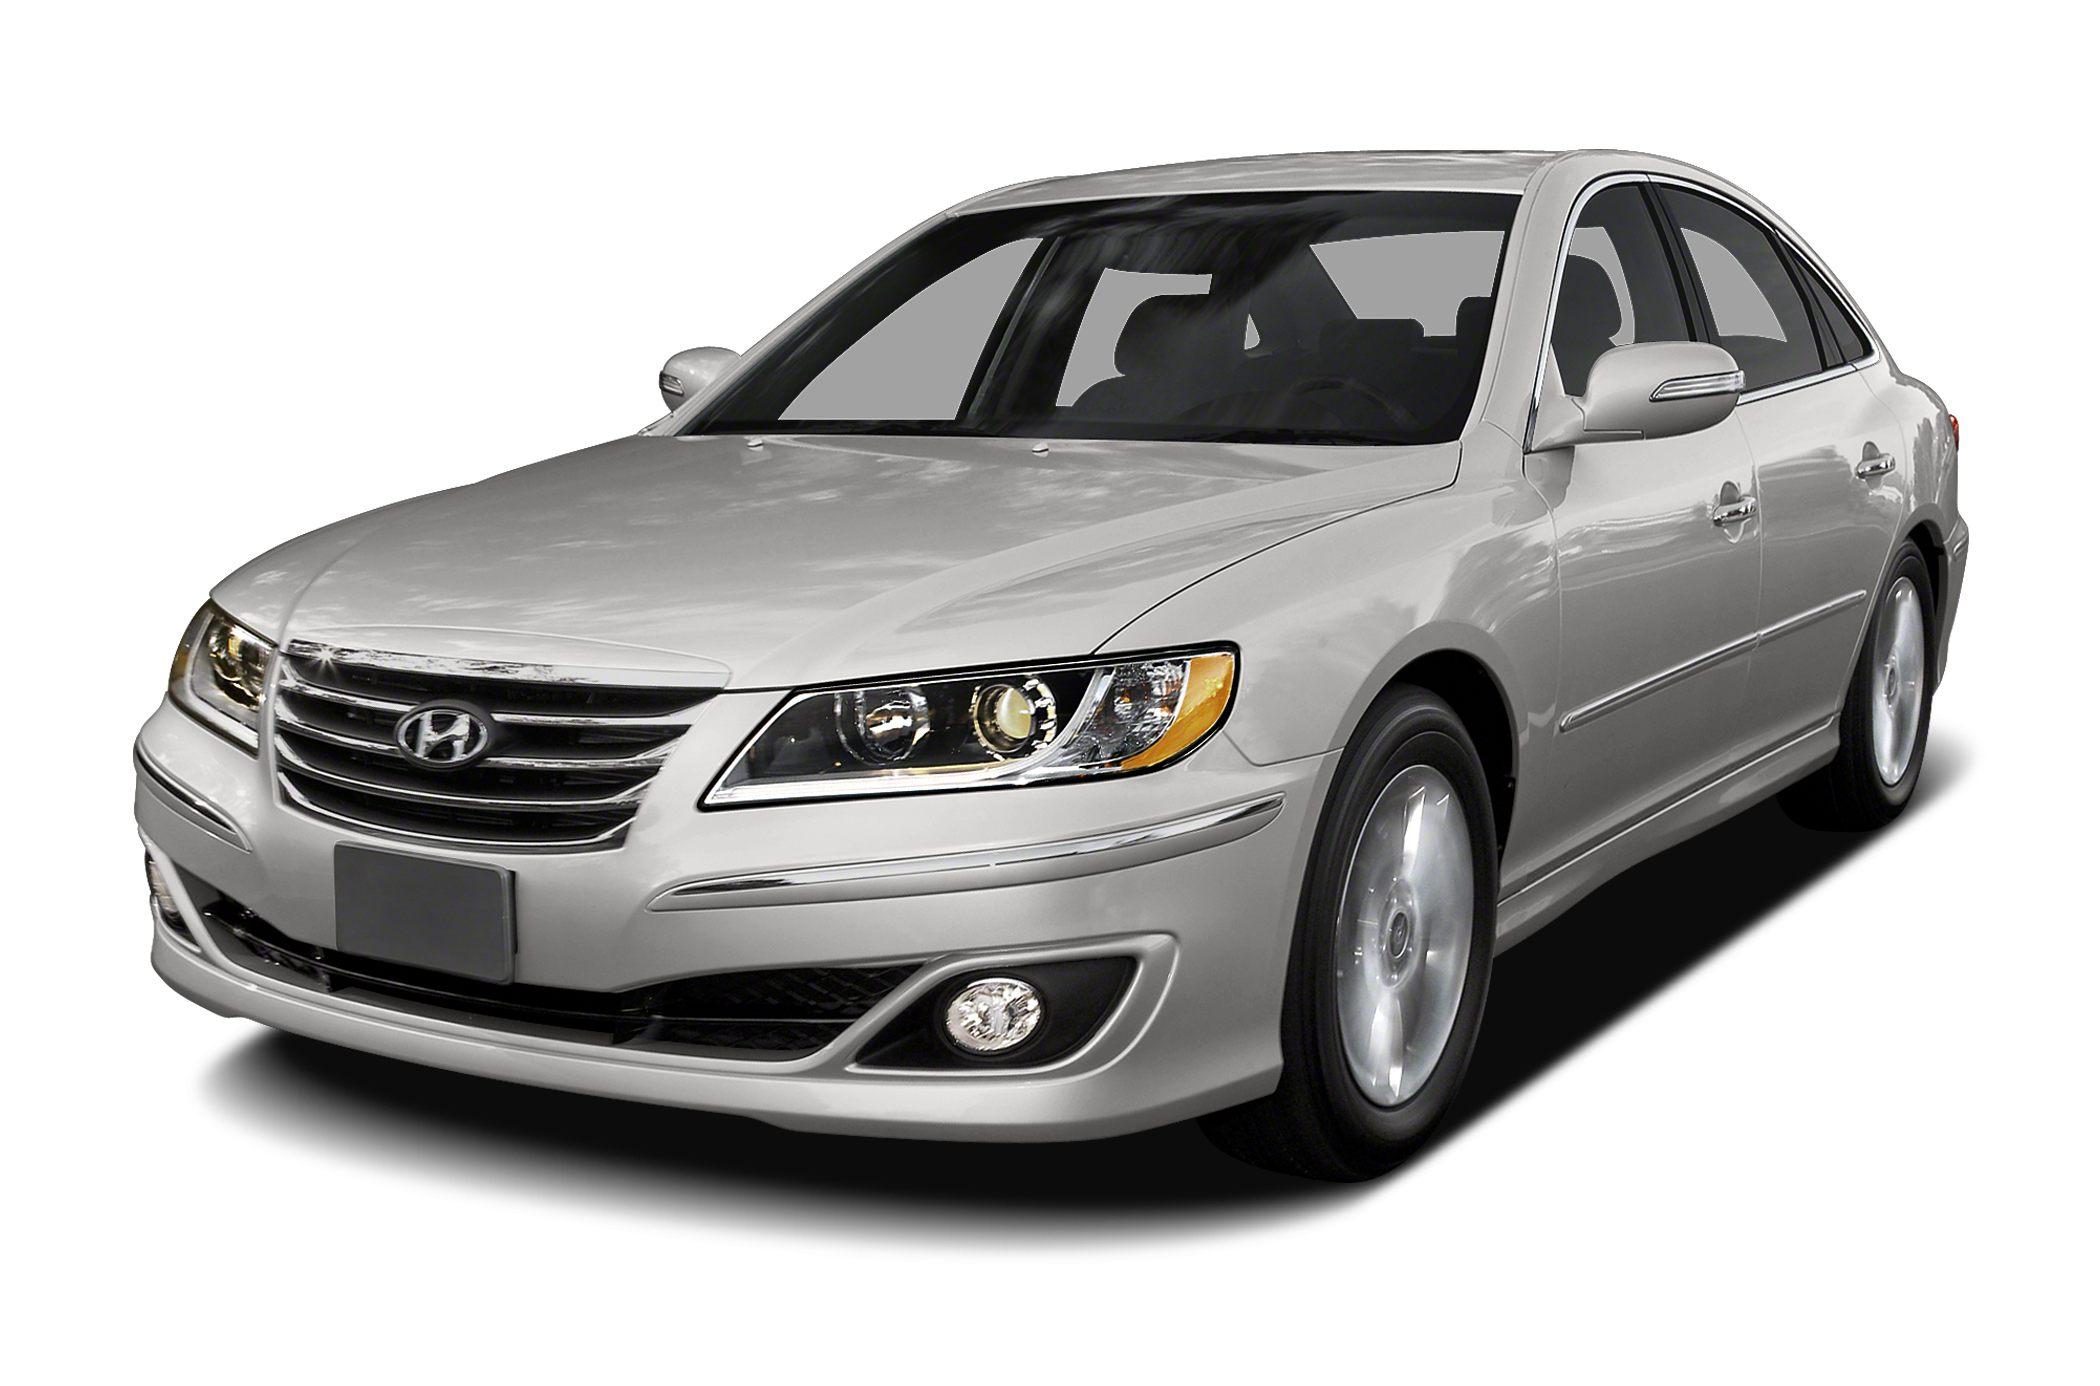 2011 Hyundai Azera